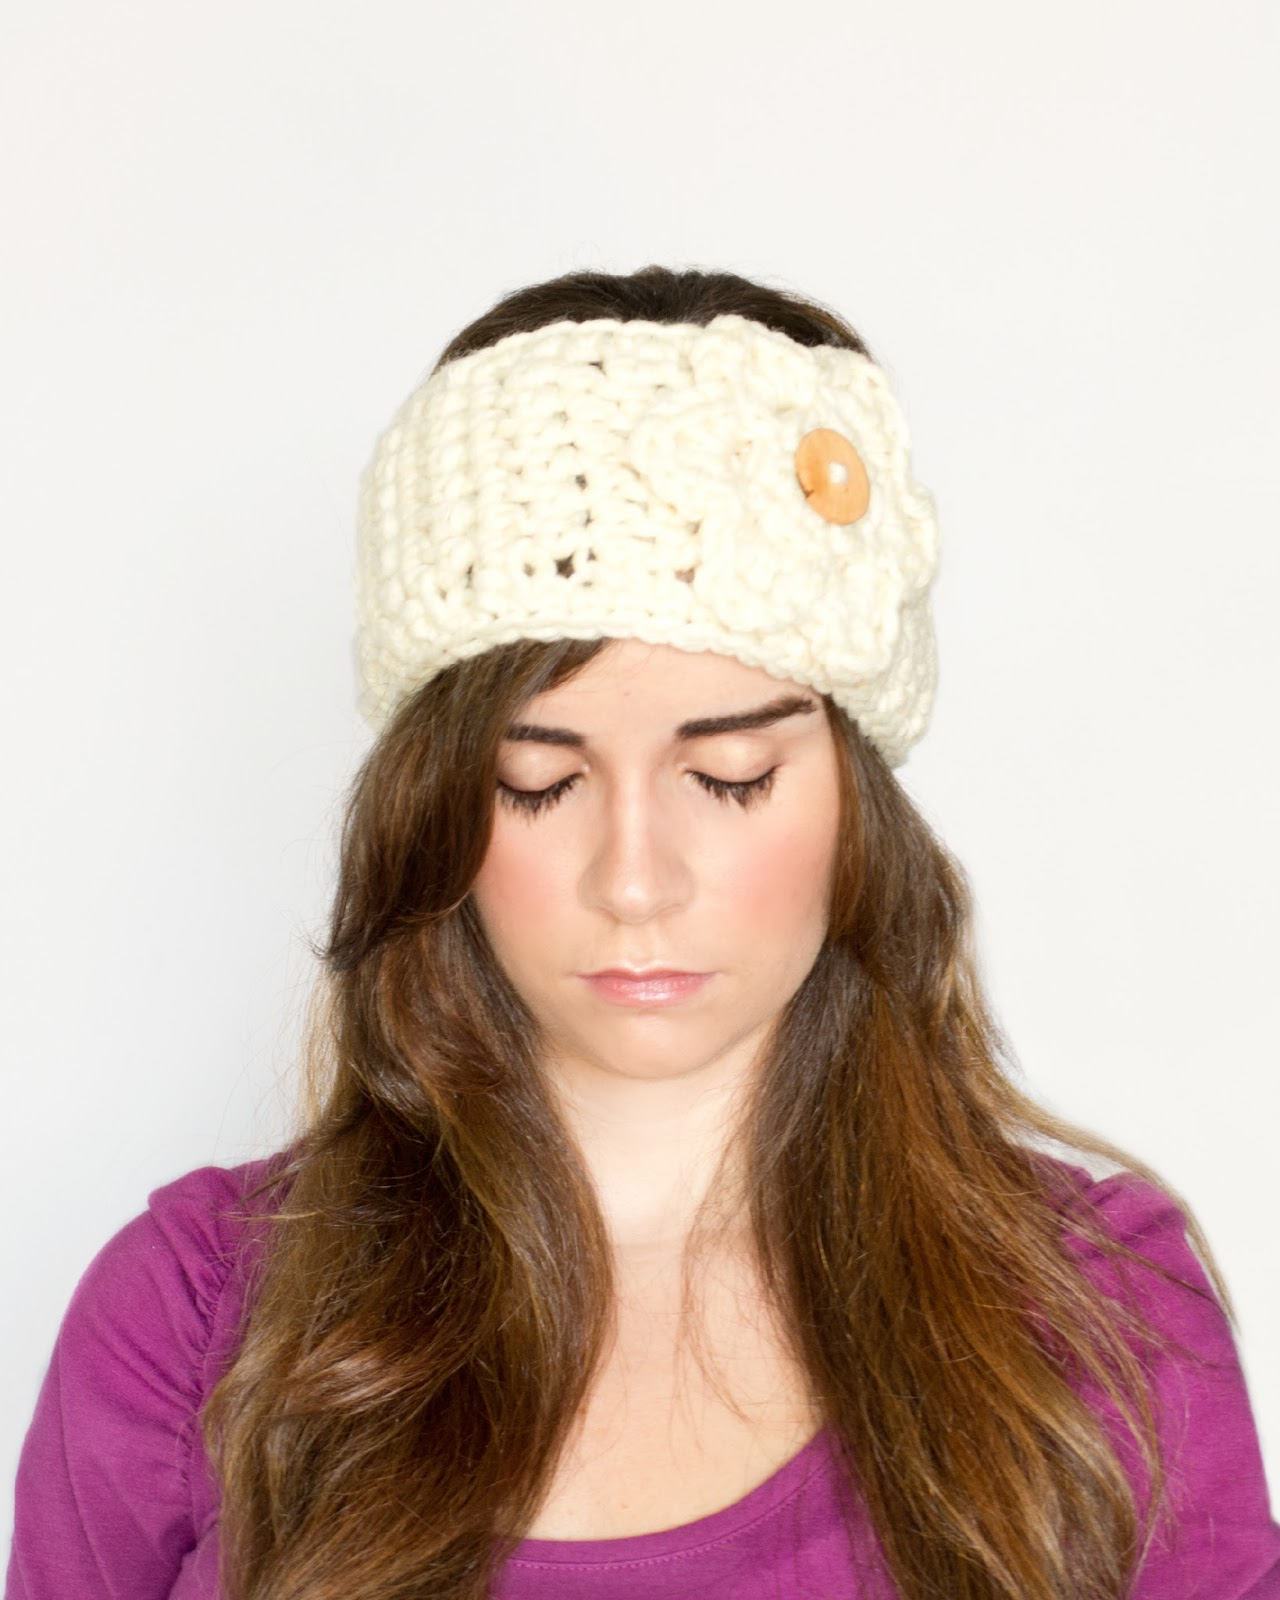 Crochet Ear Warmer Pattern Bulky Yarn : Hopeful Honey Craft, Crochet, Create: Charmfully Chunky ...